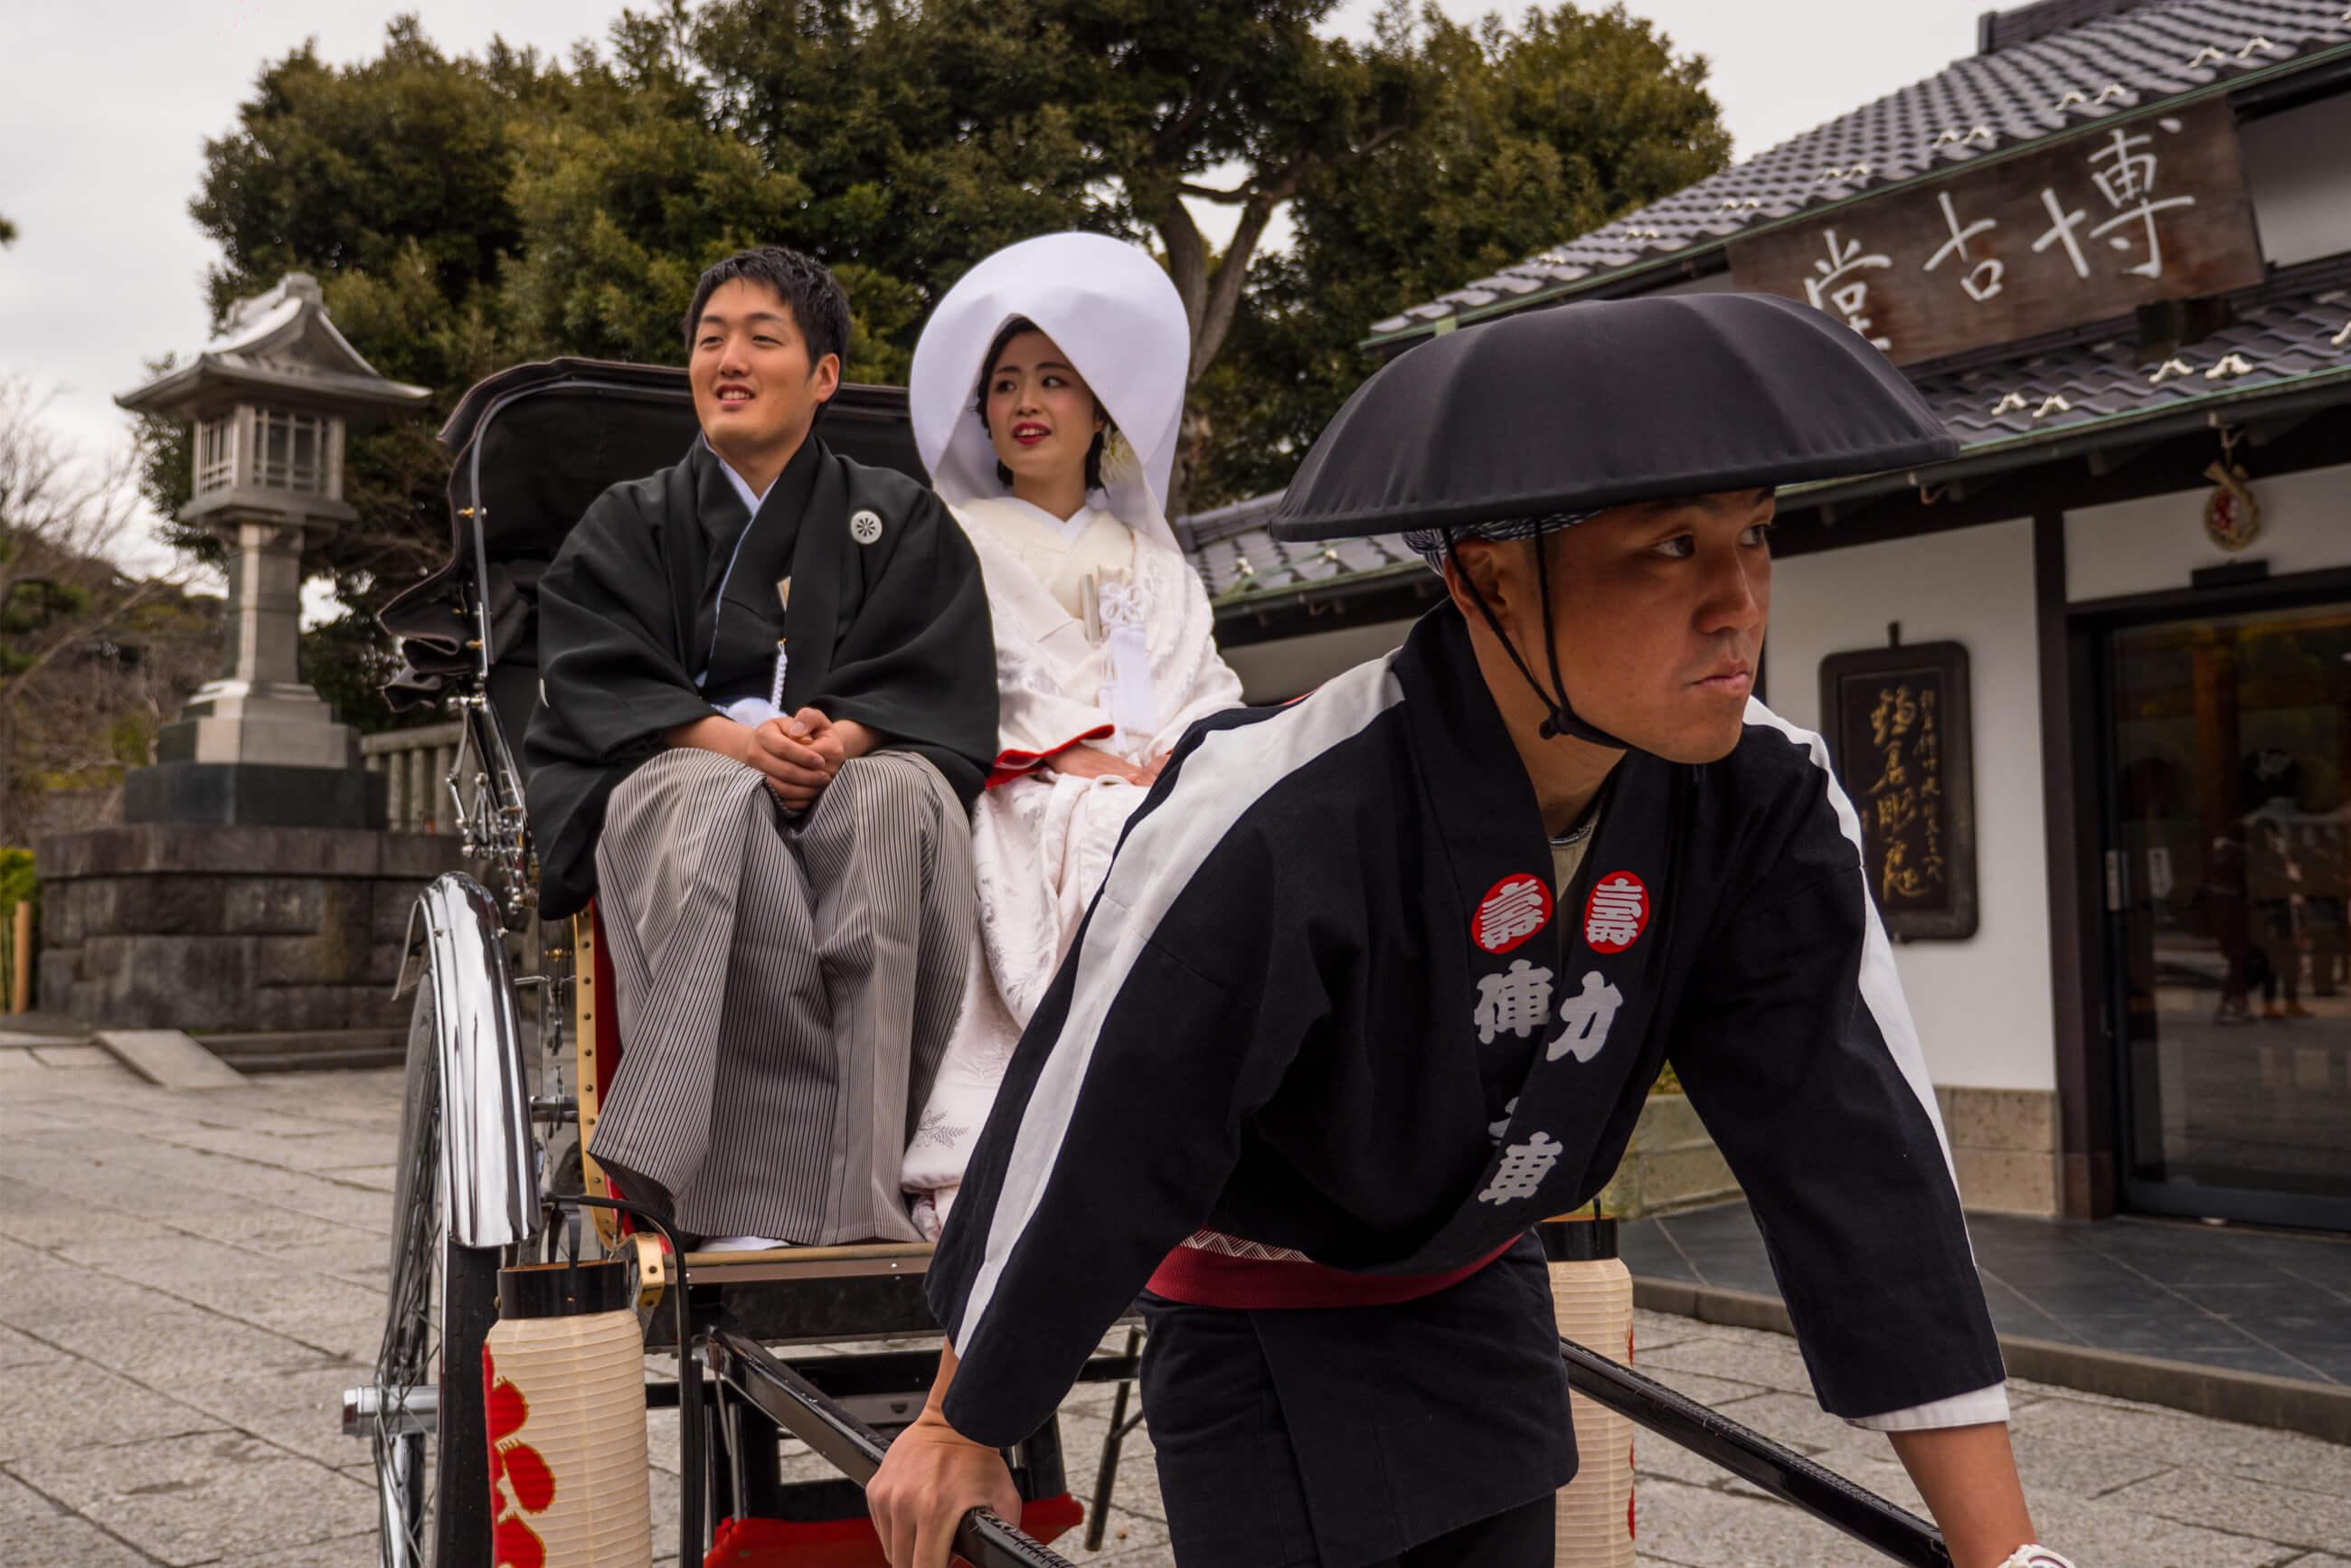 https://bubo.sk/uploads/galleries/7300/martinsimko_japonsko_shintoisticka-svadba.jpg